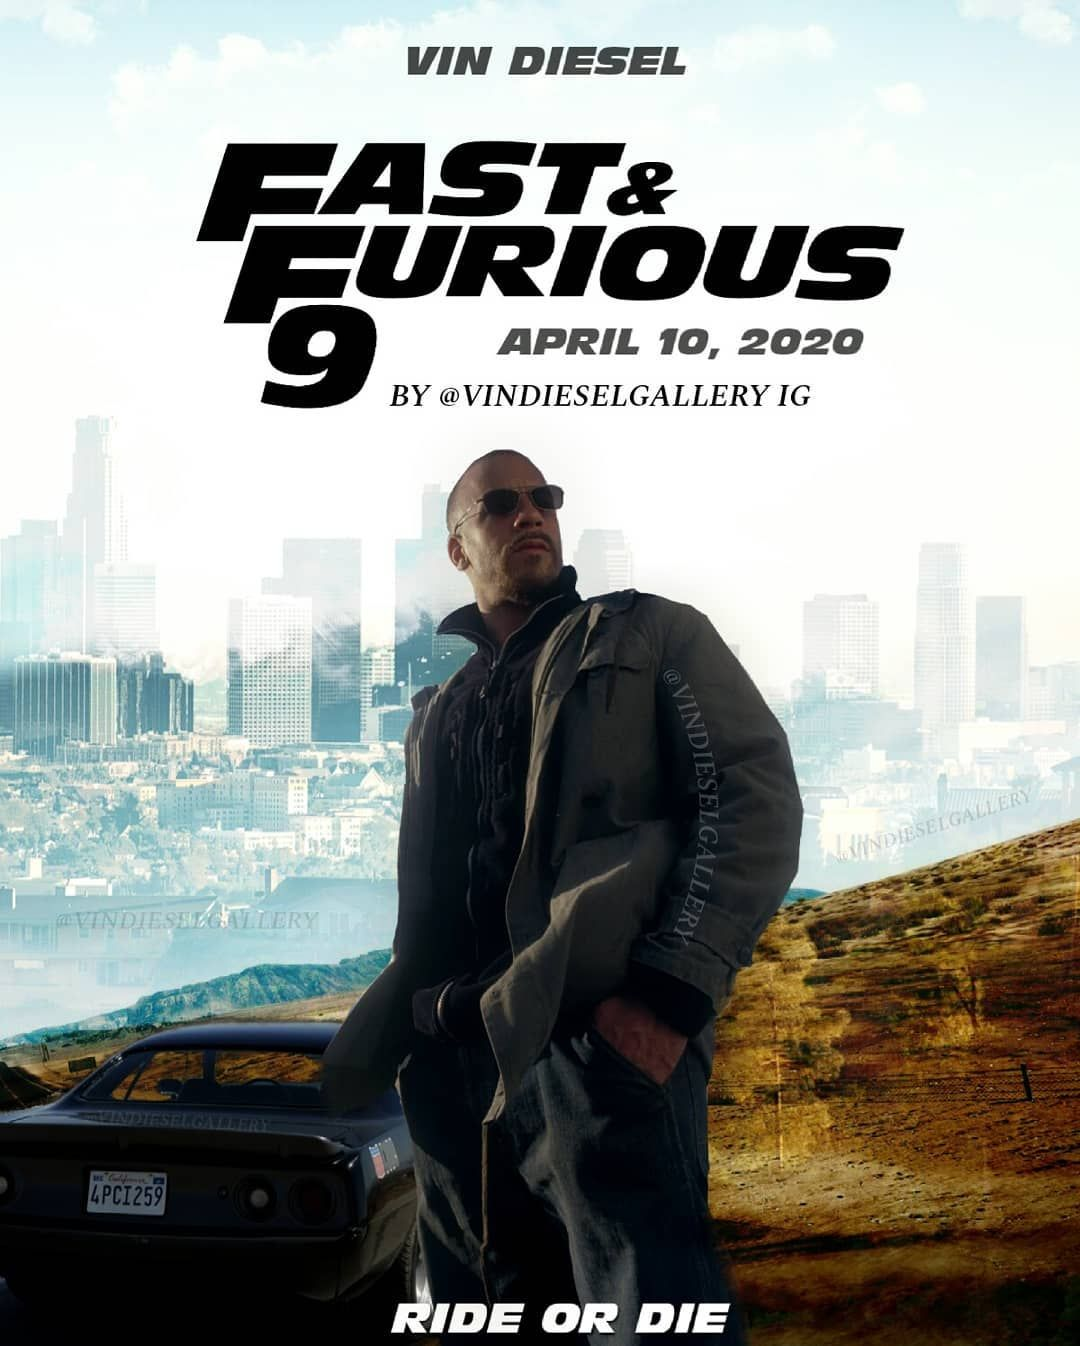 4 025 Likes 56 Comments Vin Diesel Gallery Vindieselgallery On Instagram It S A Fastandfurious9 Edi Movie Fast And Furious Fast And Furious Vin Diesel